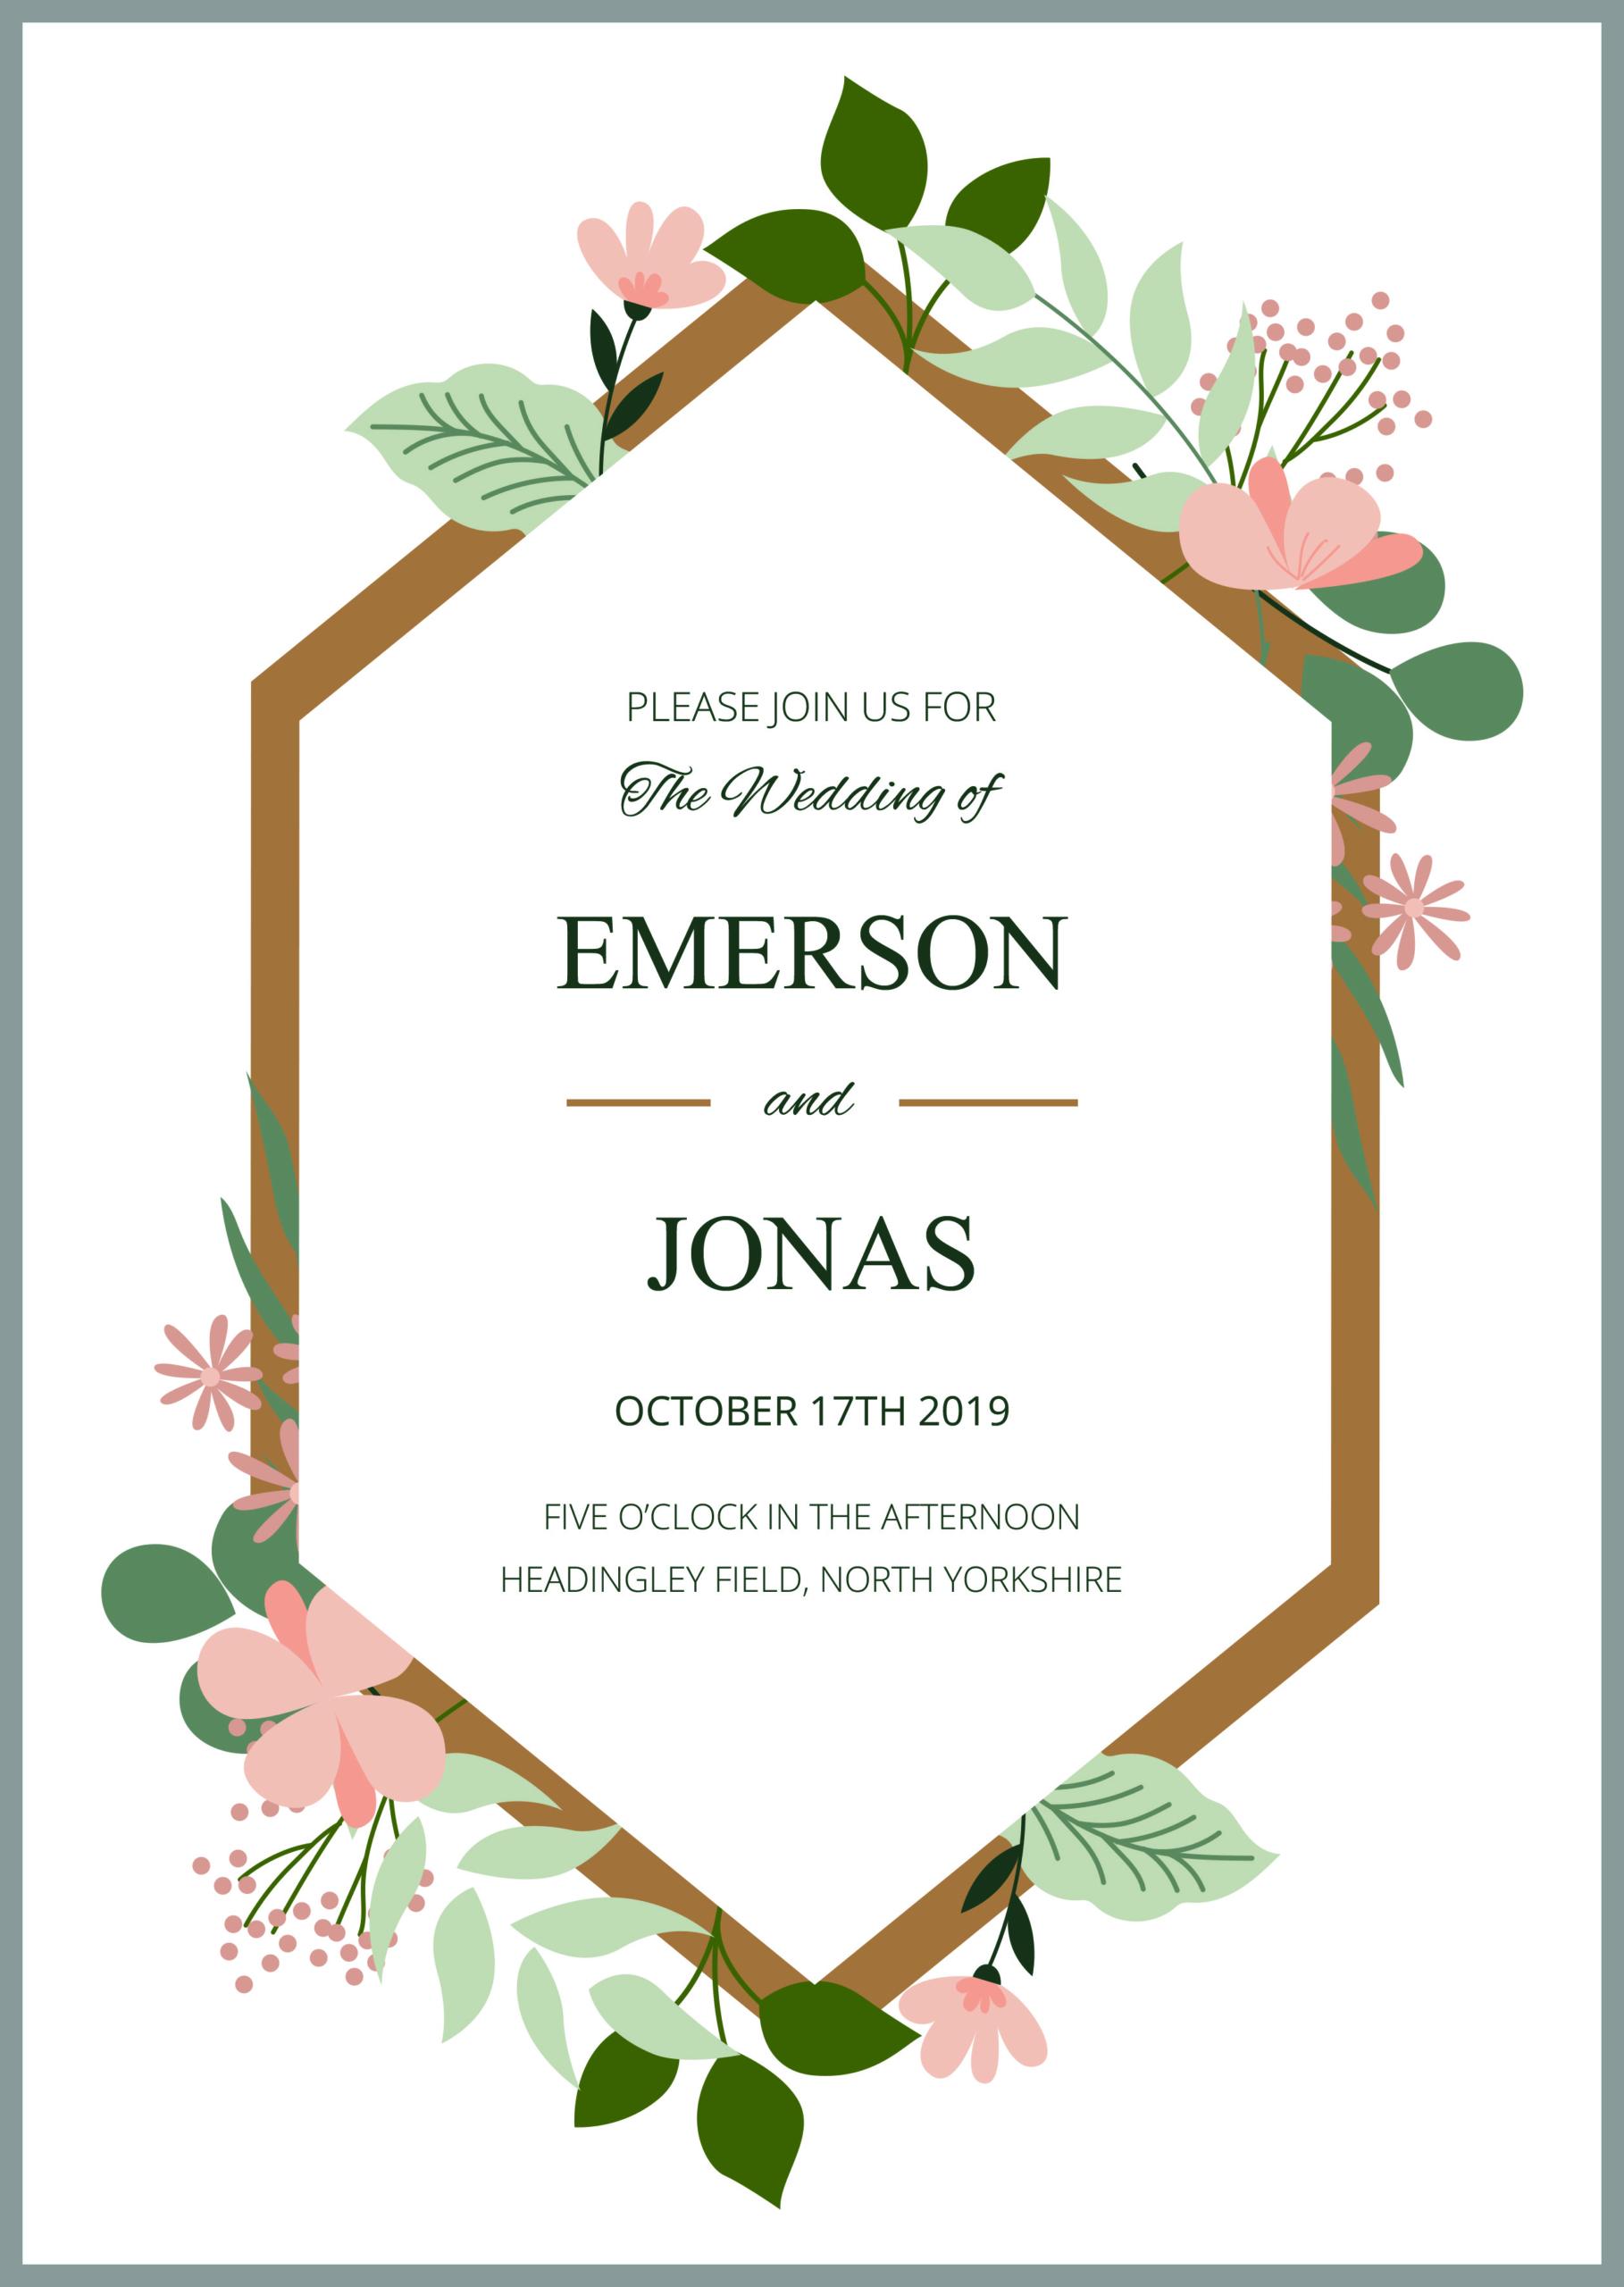 5 Free Wedding Invitation Template Cards - Printable And Editable PSD